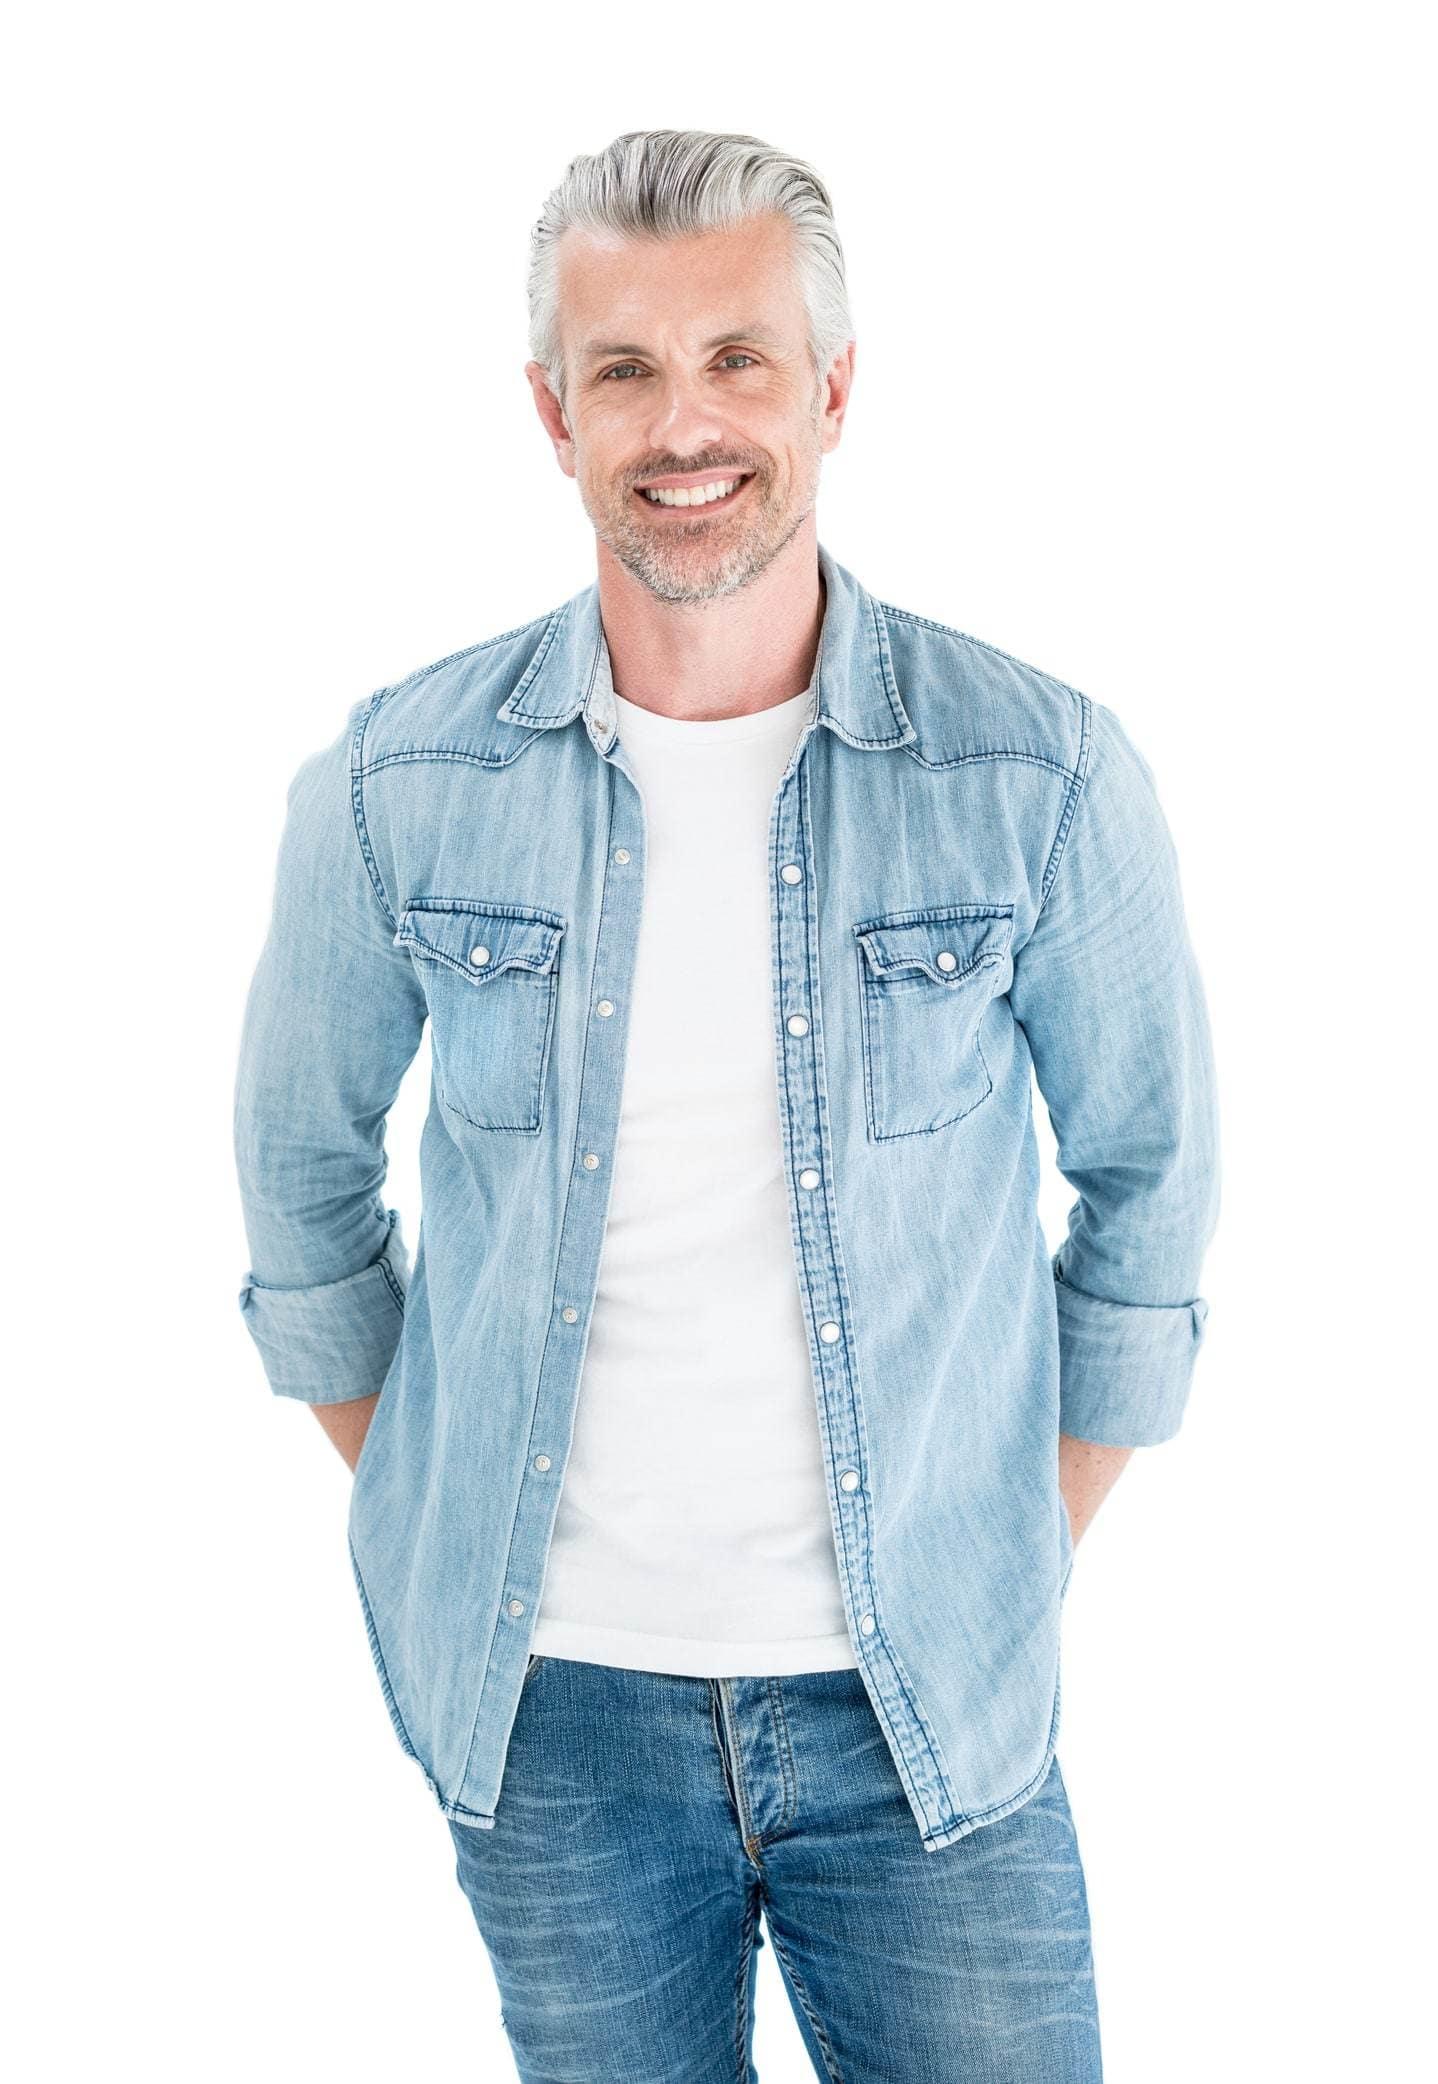 Trendy Men's Popular Haircuts -Short on Sides Long 4